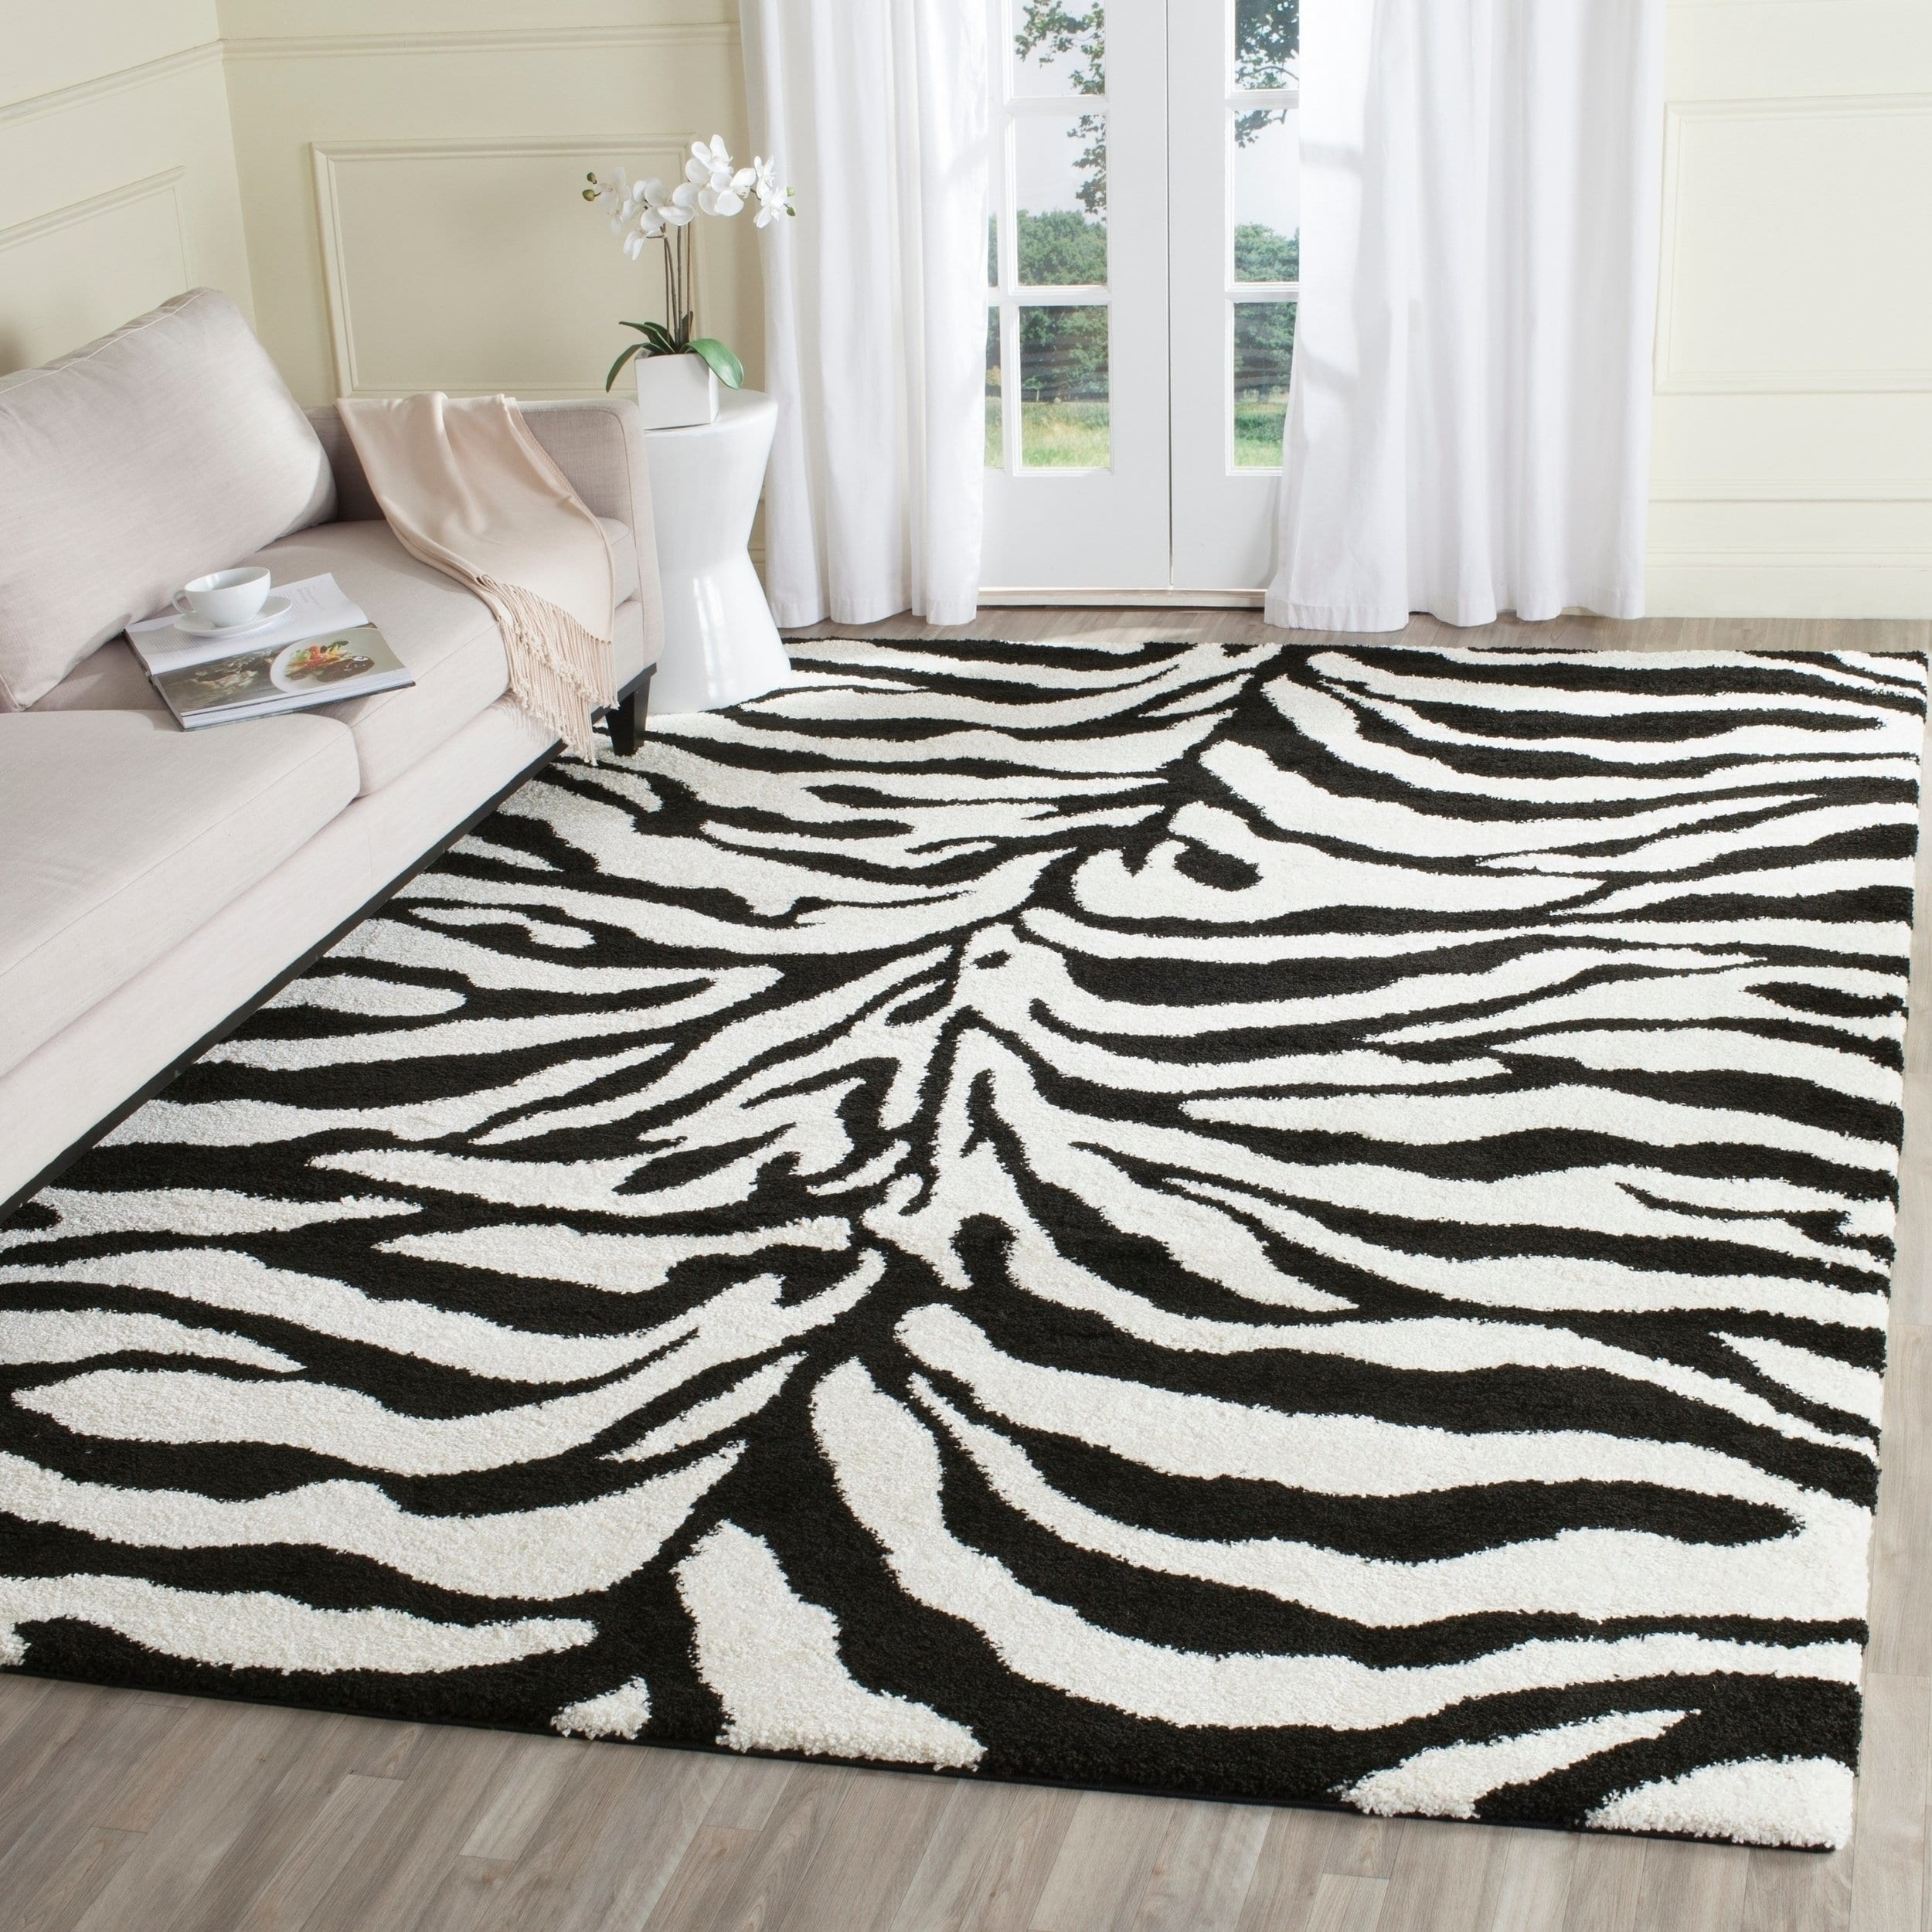 Safavieh Florida Shag Rozinka Zebra Animal Print Rug